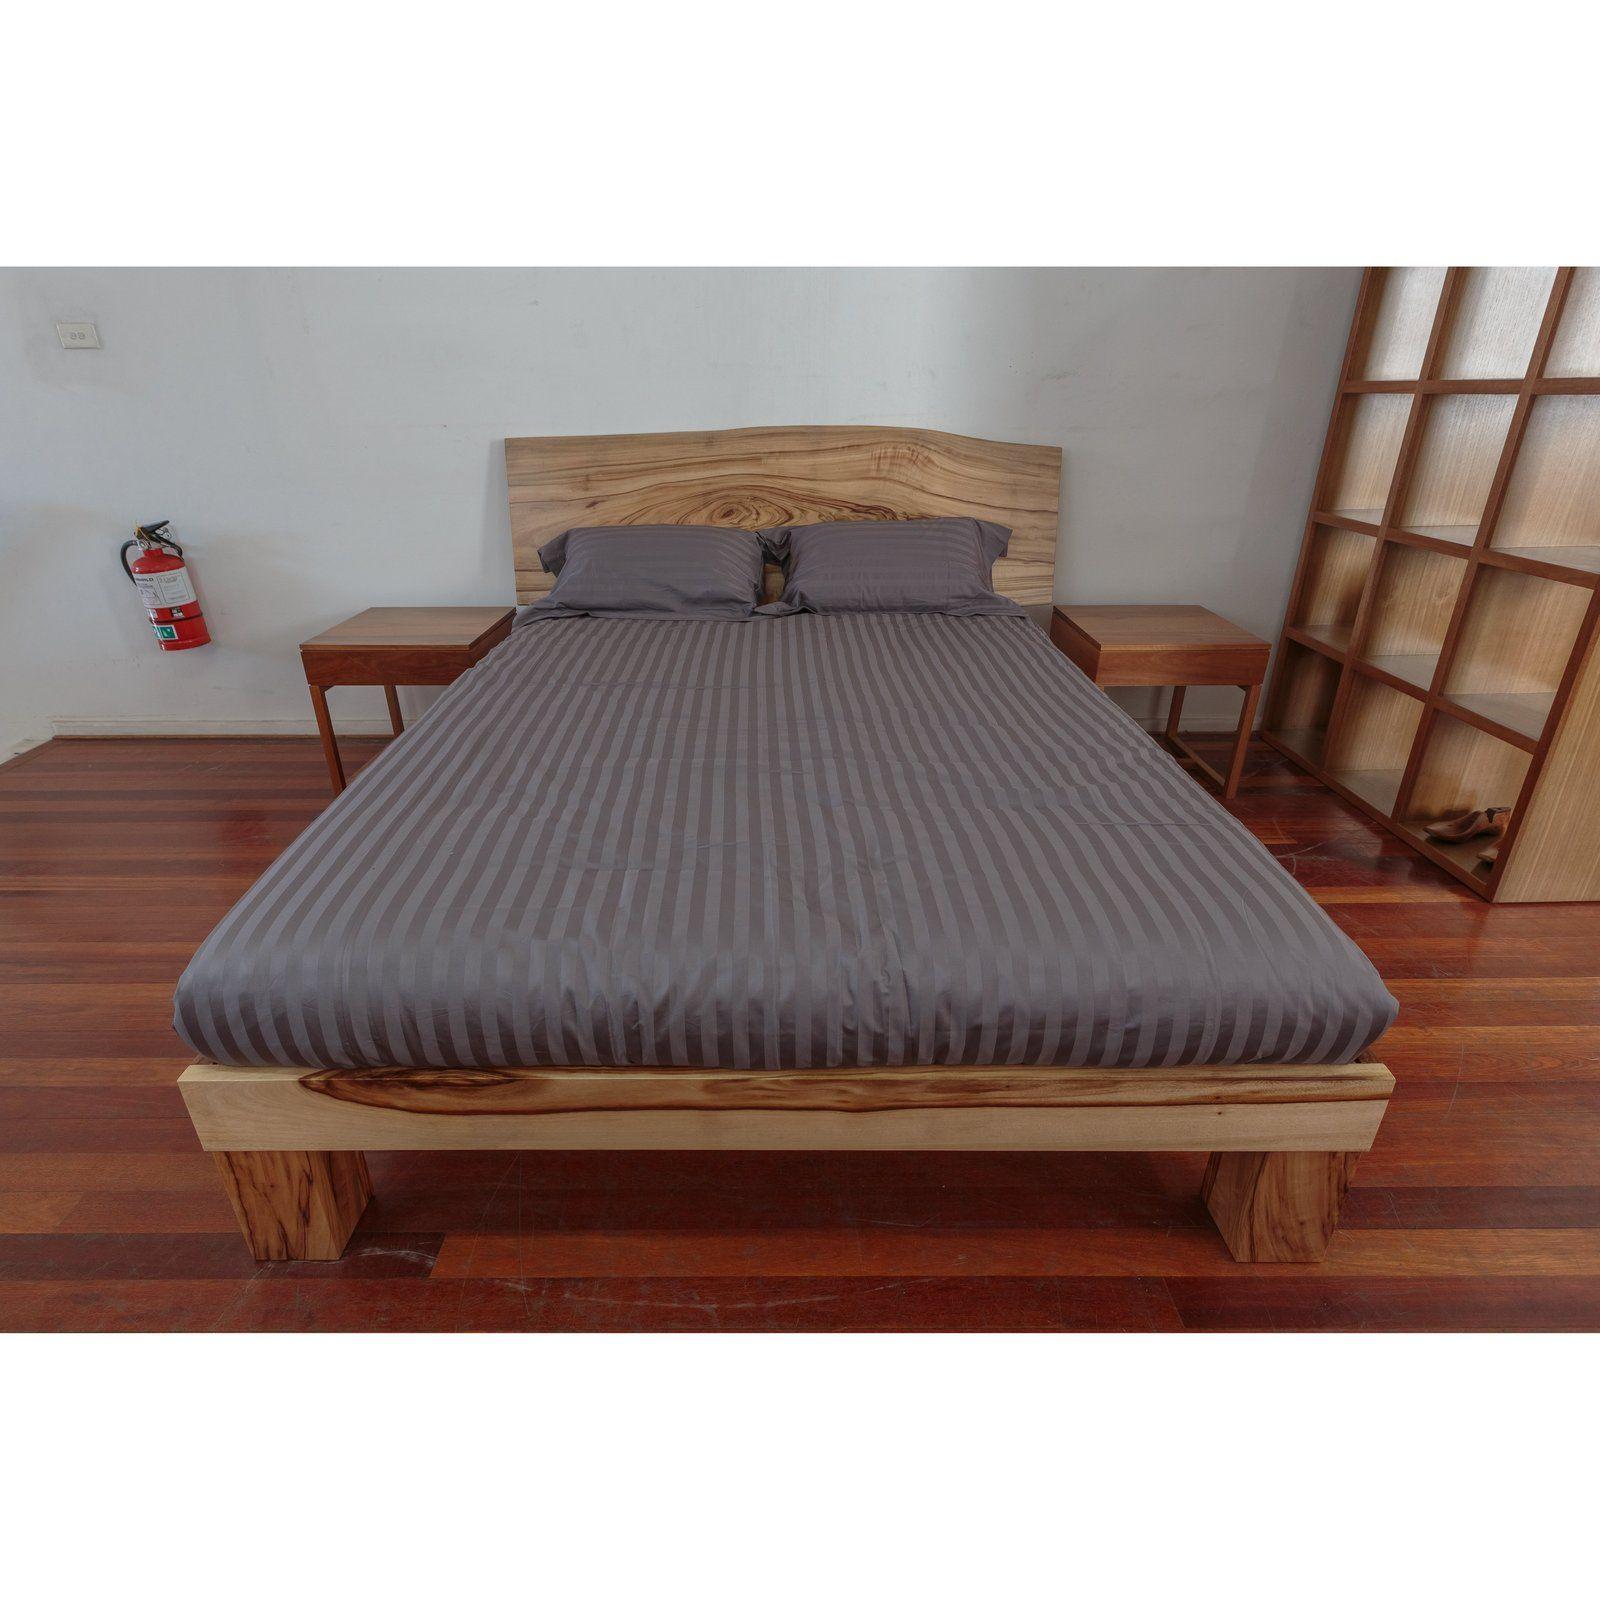 Camphor Laurel Slab Bed Wildwood Designs Furniture in